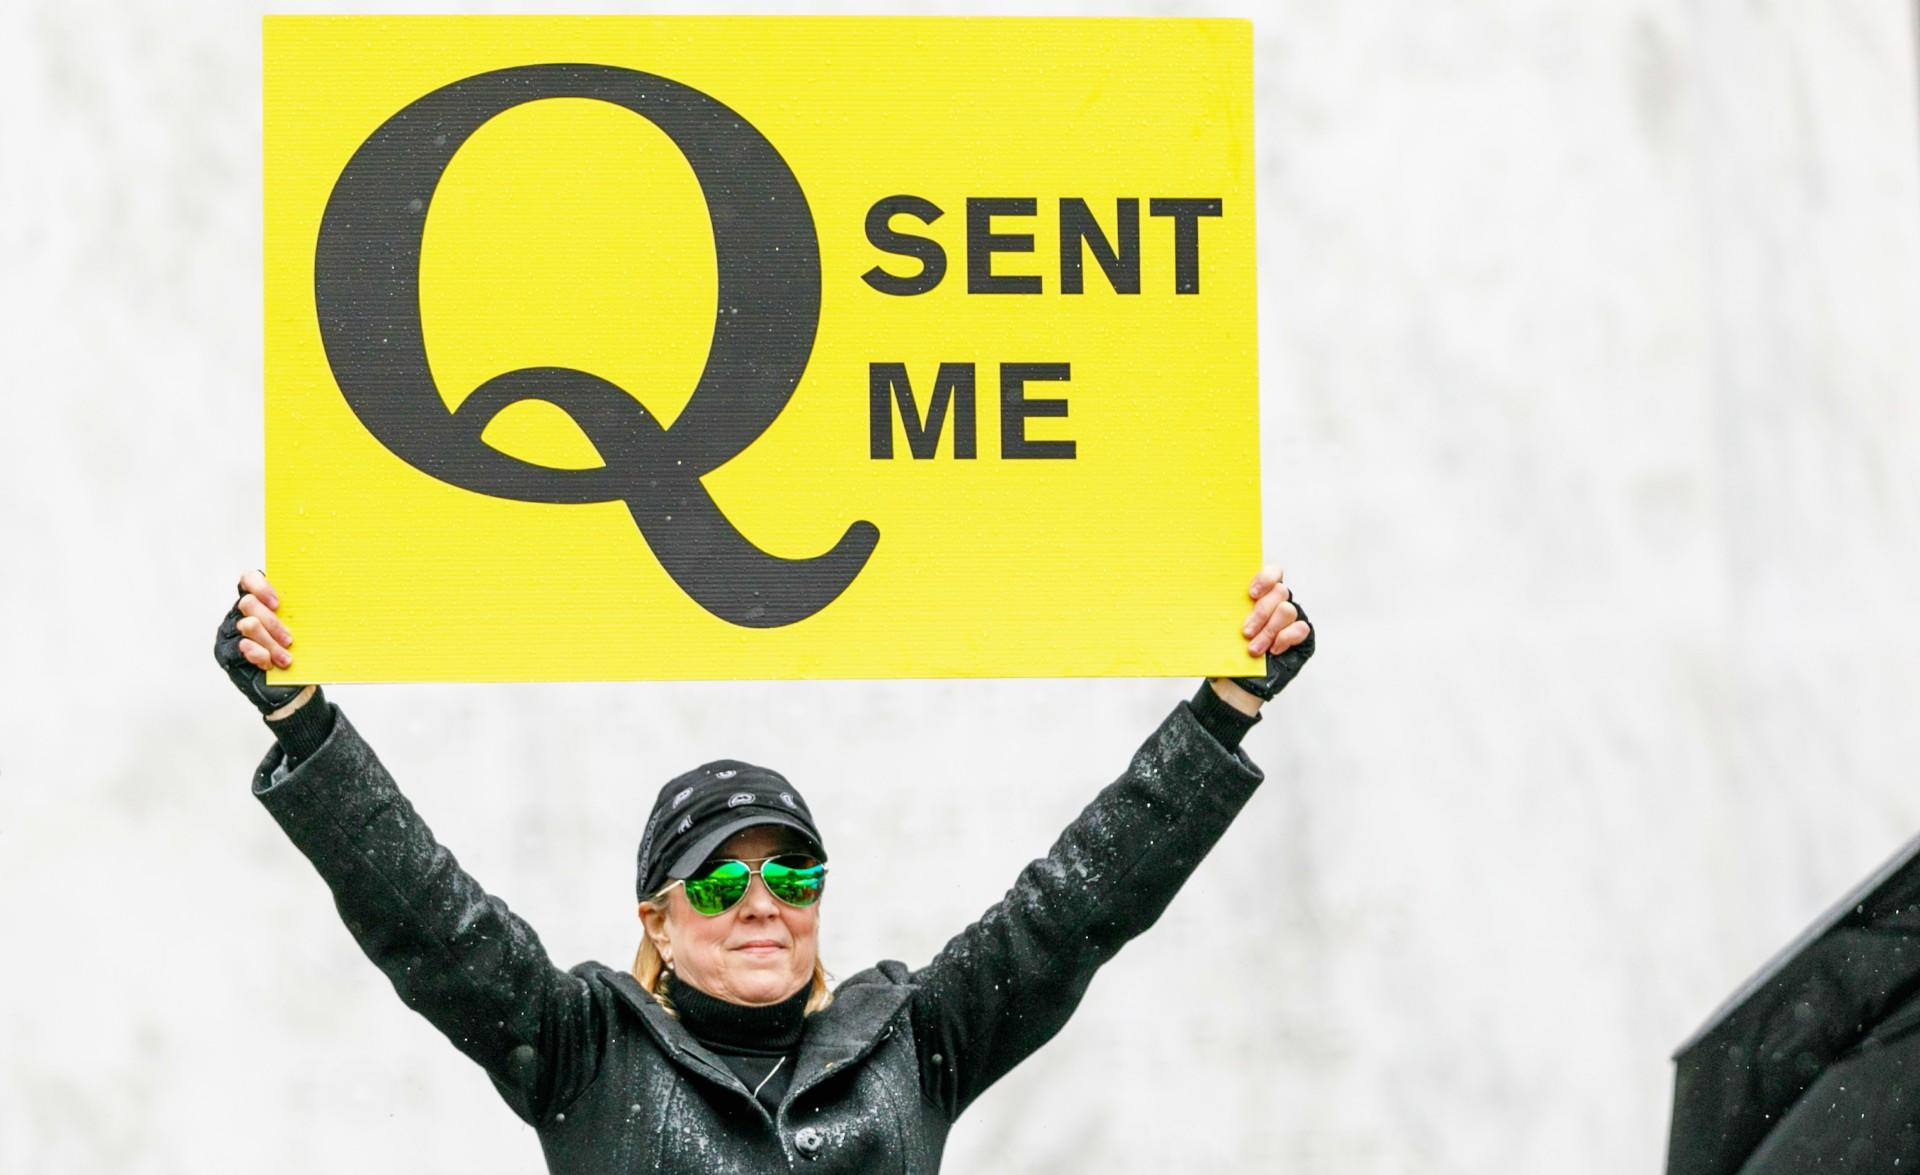 QAnon: Why rabid pro-Trump conspiracy theories keep gaining steam